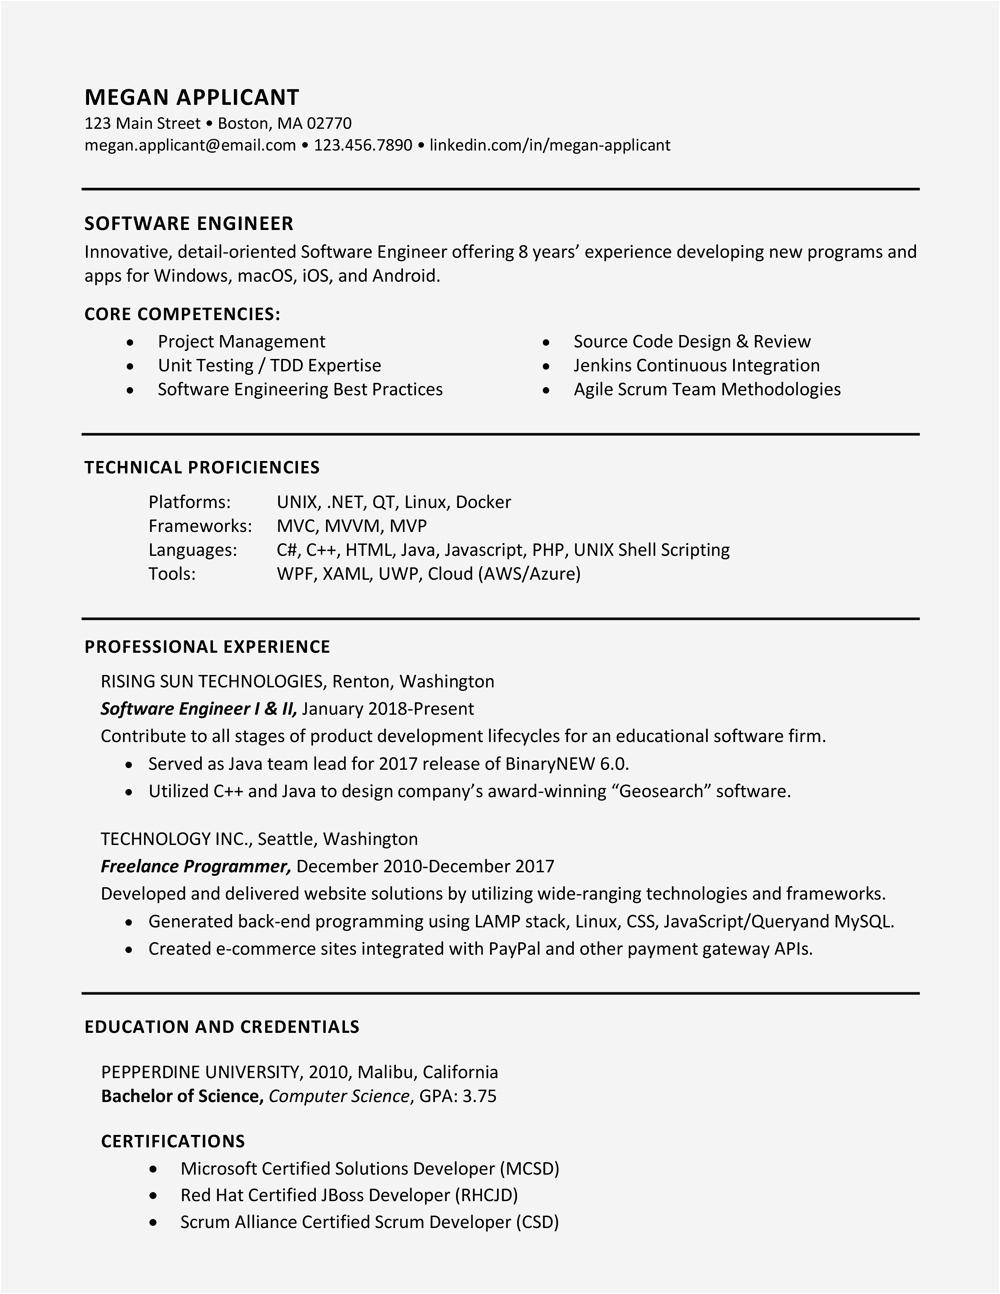 Describe Your Computer Skills Resume Sample 14 Describe Your Puter Skills Resume Sample Samples